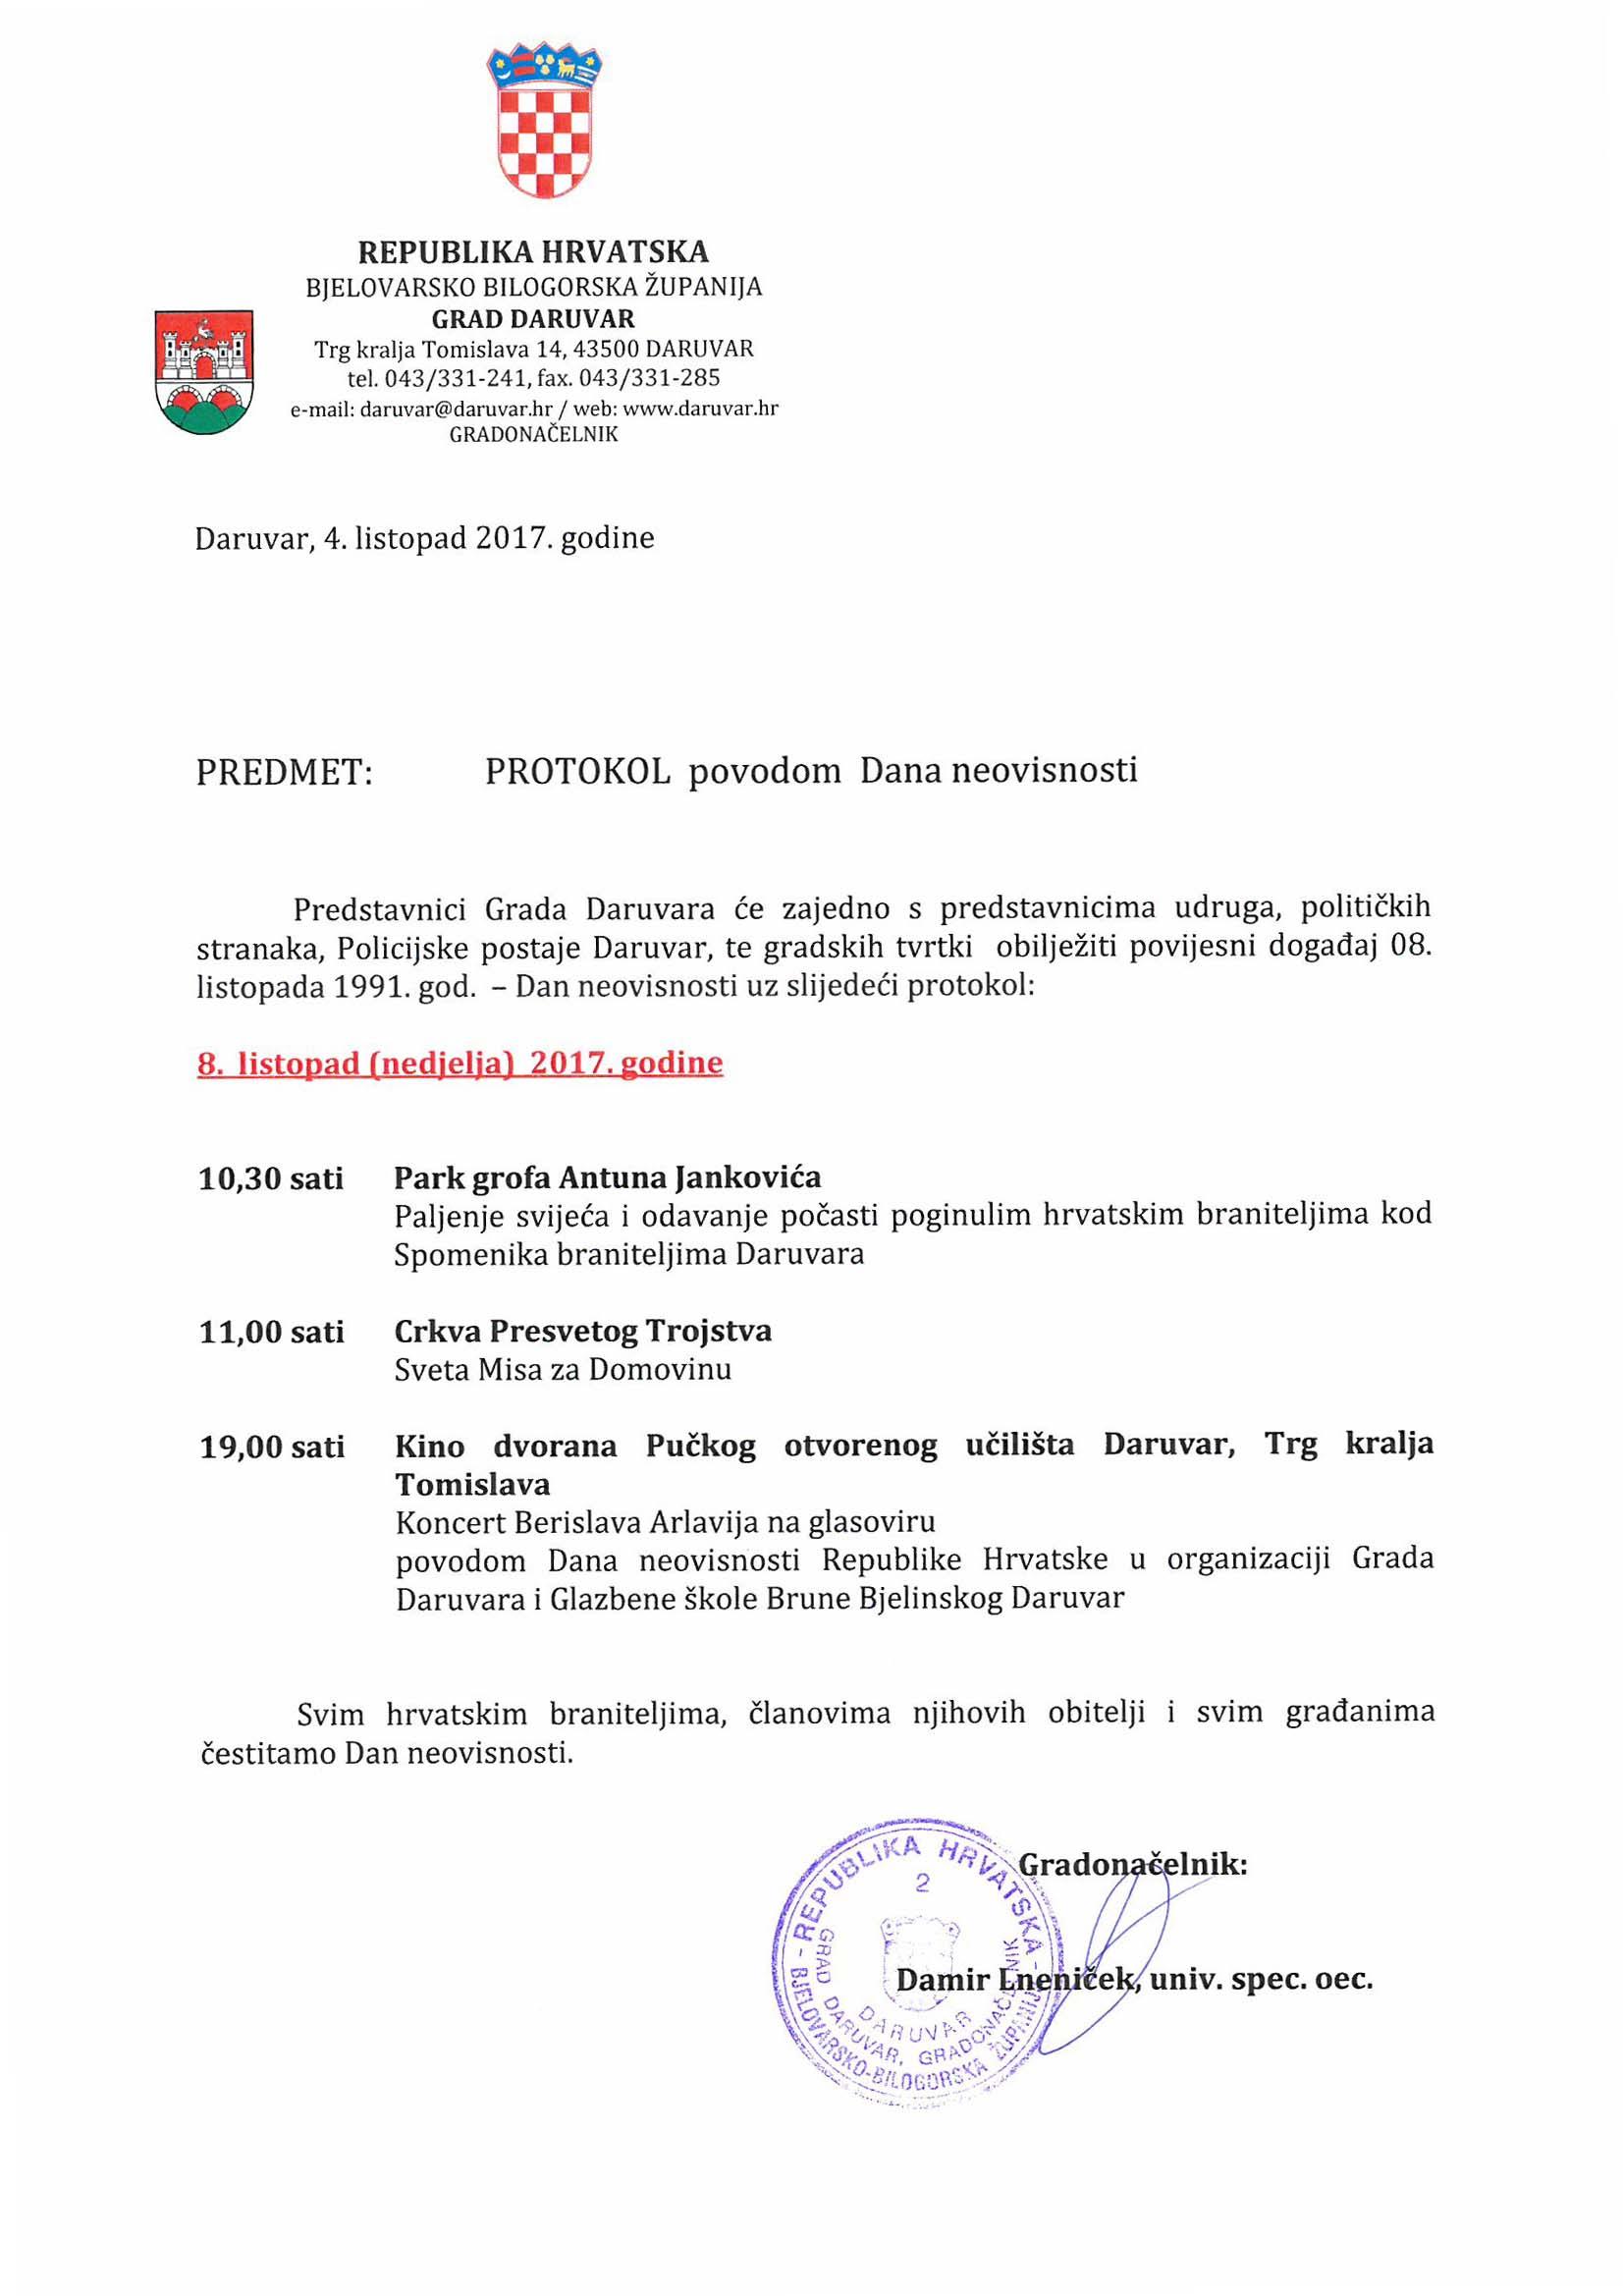 Protokol povodom Dana neovisnosti